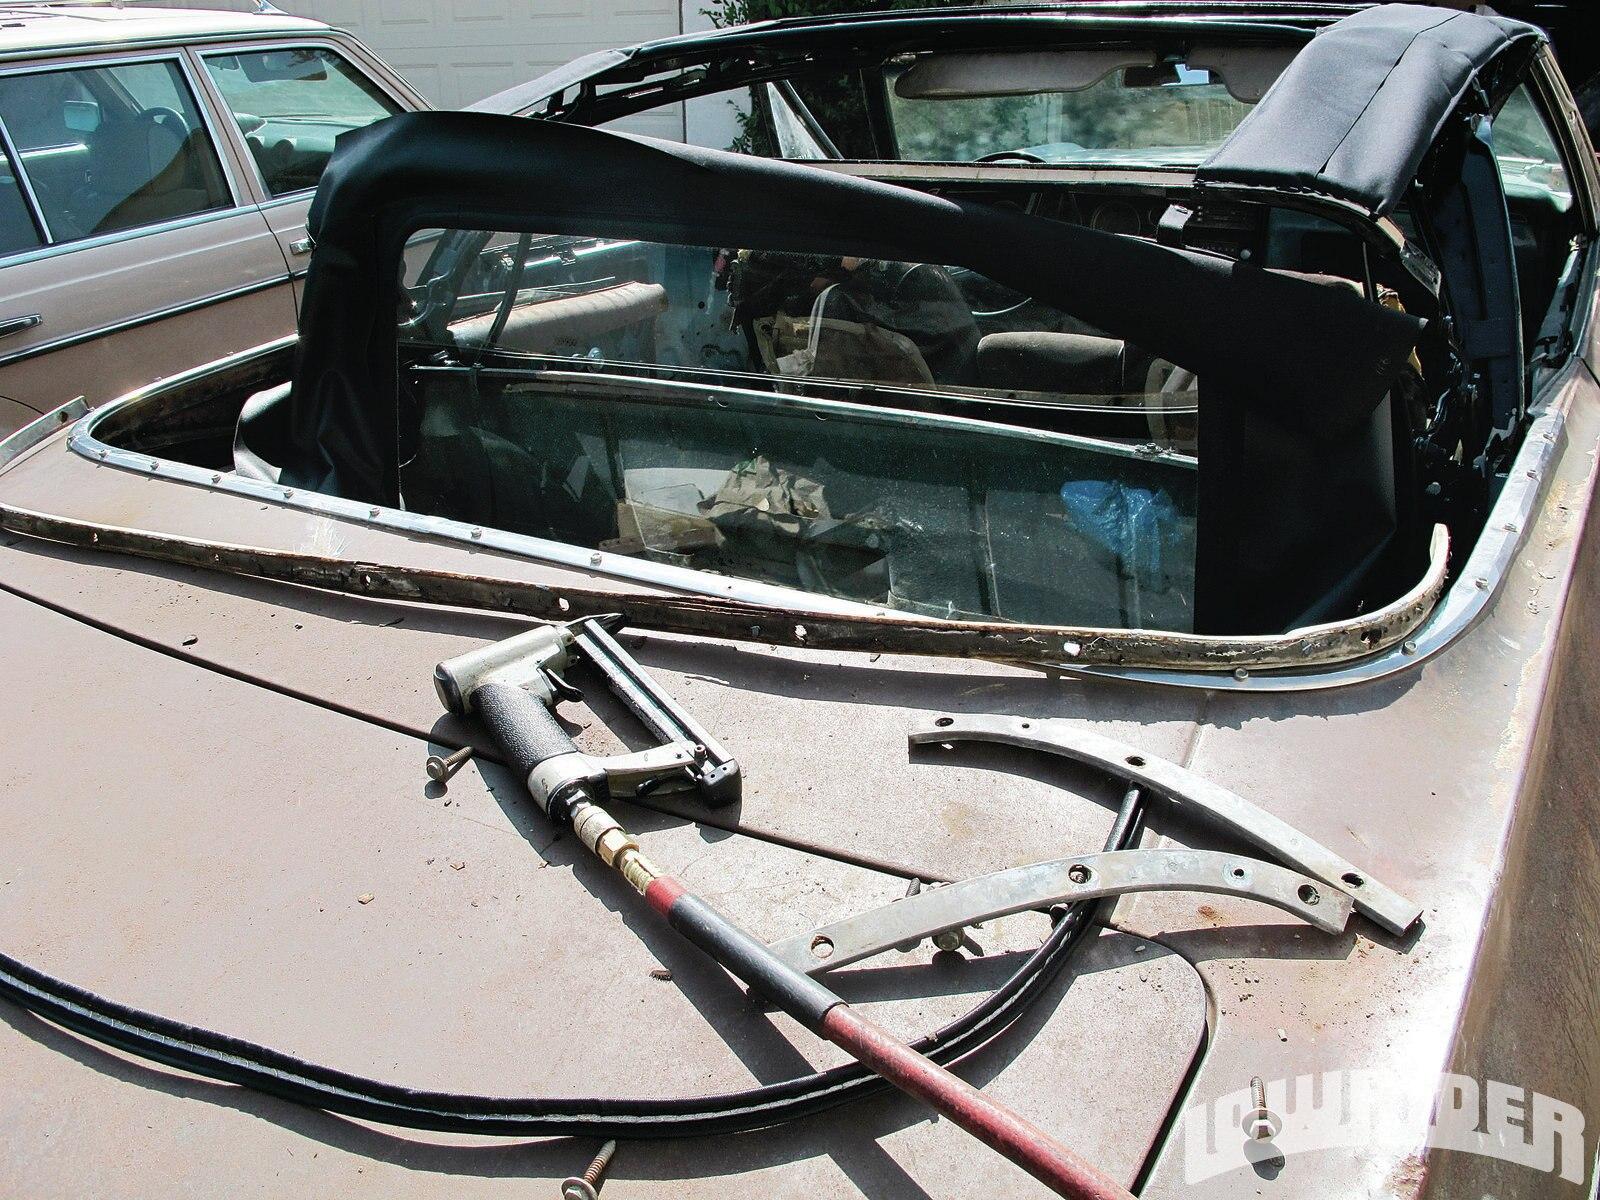 lrmp-1207-01-o-convertible-top-install-project1